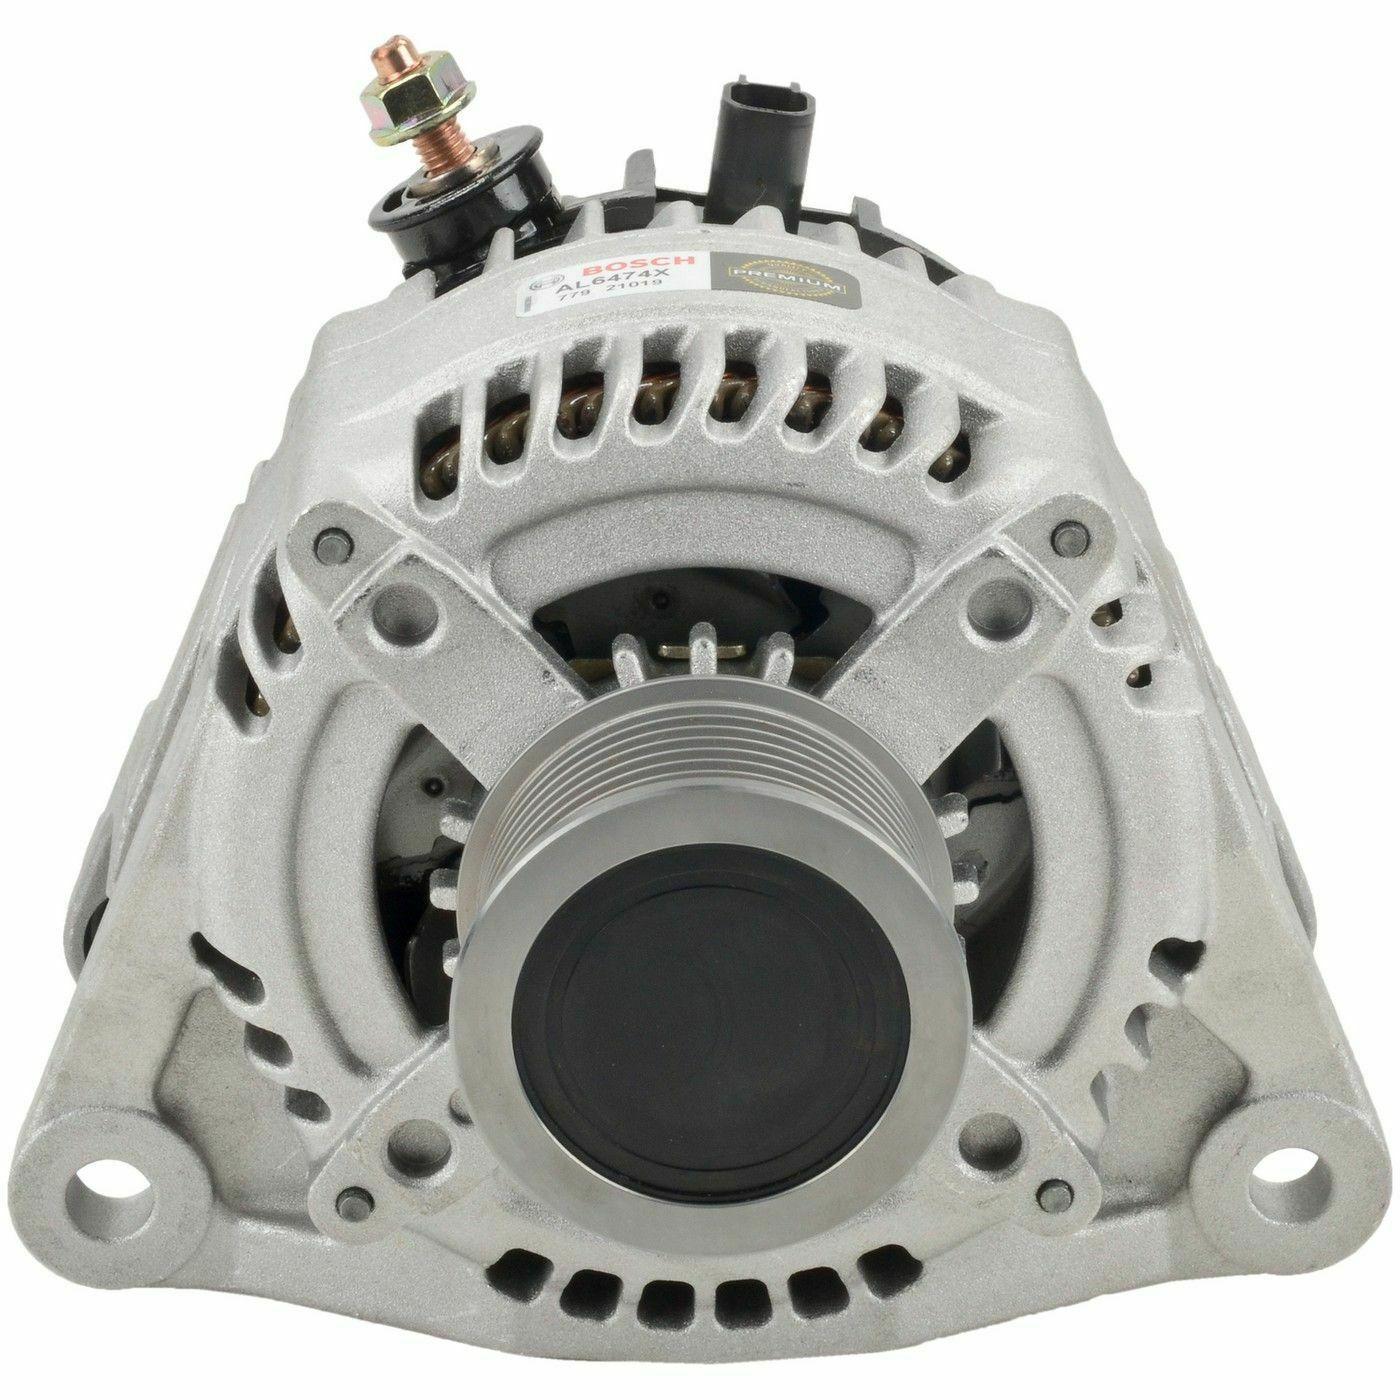 Bosch Reman Alternator for 07.5-13 6.7L Cummins ISB